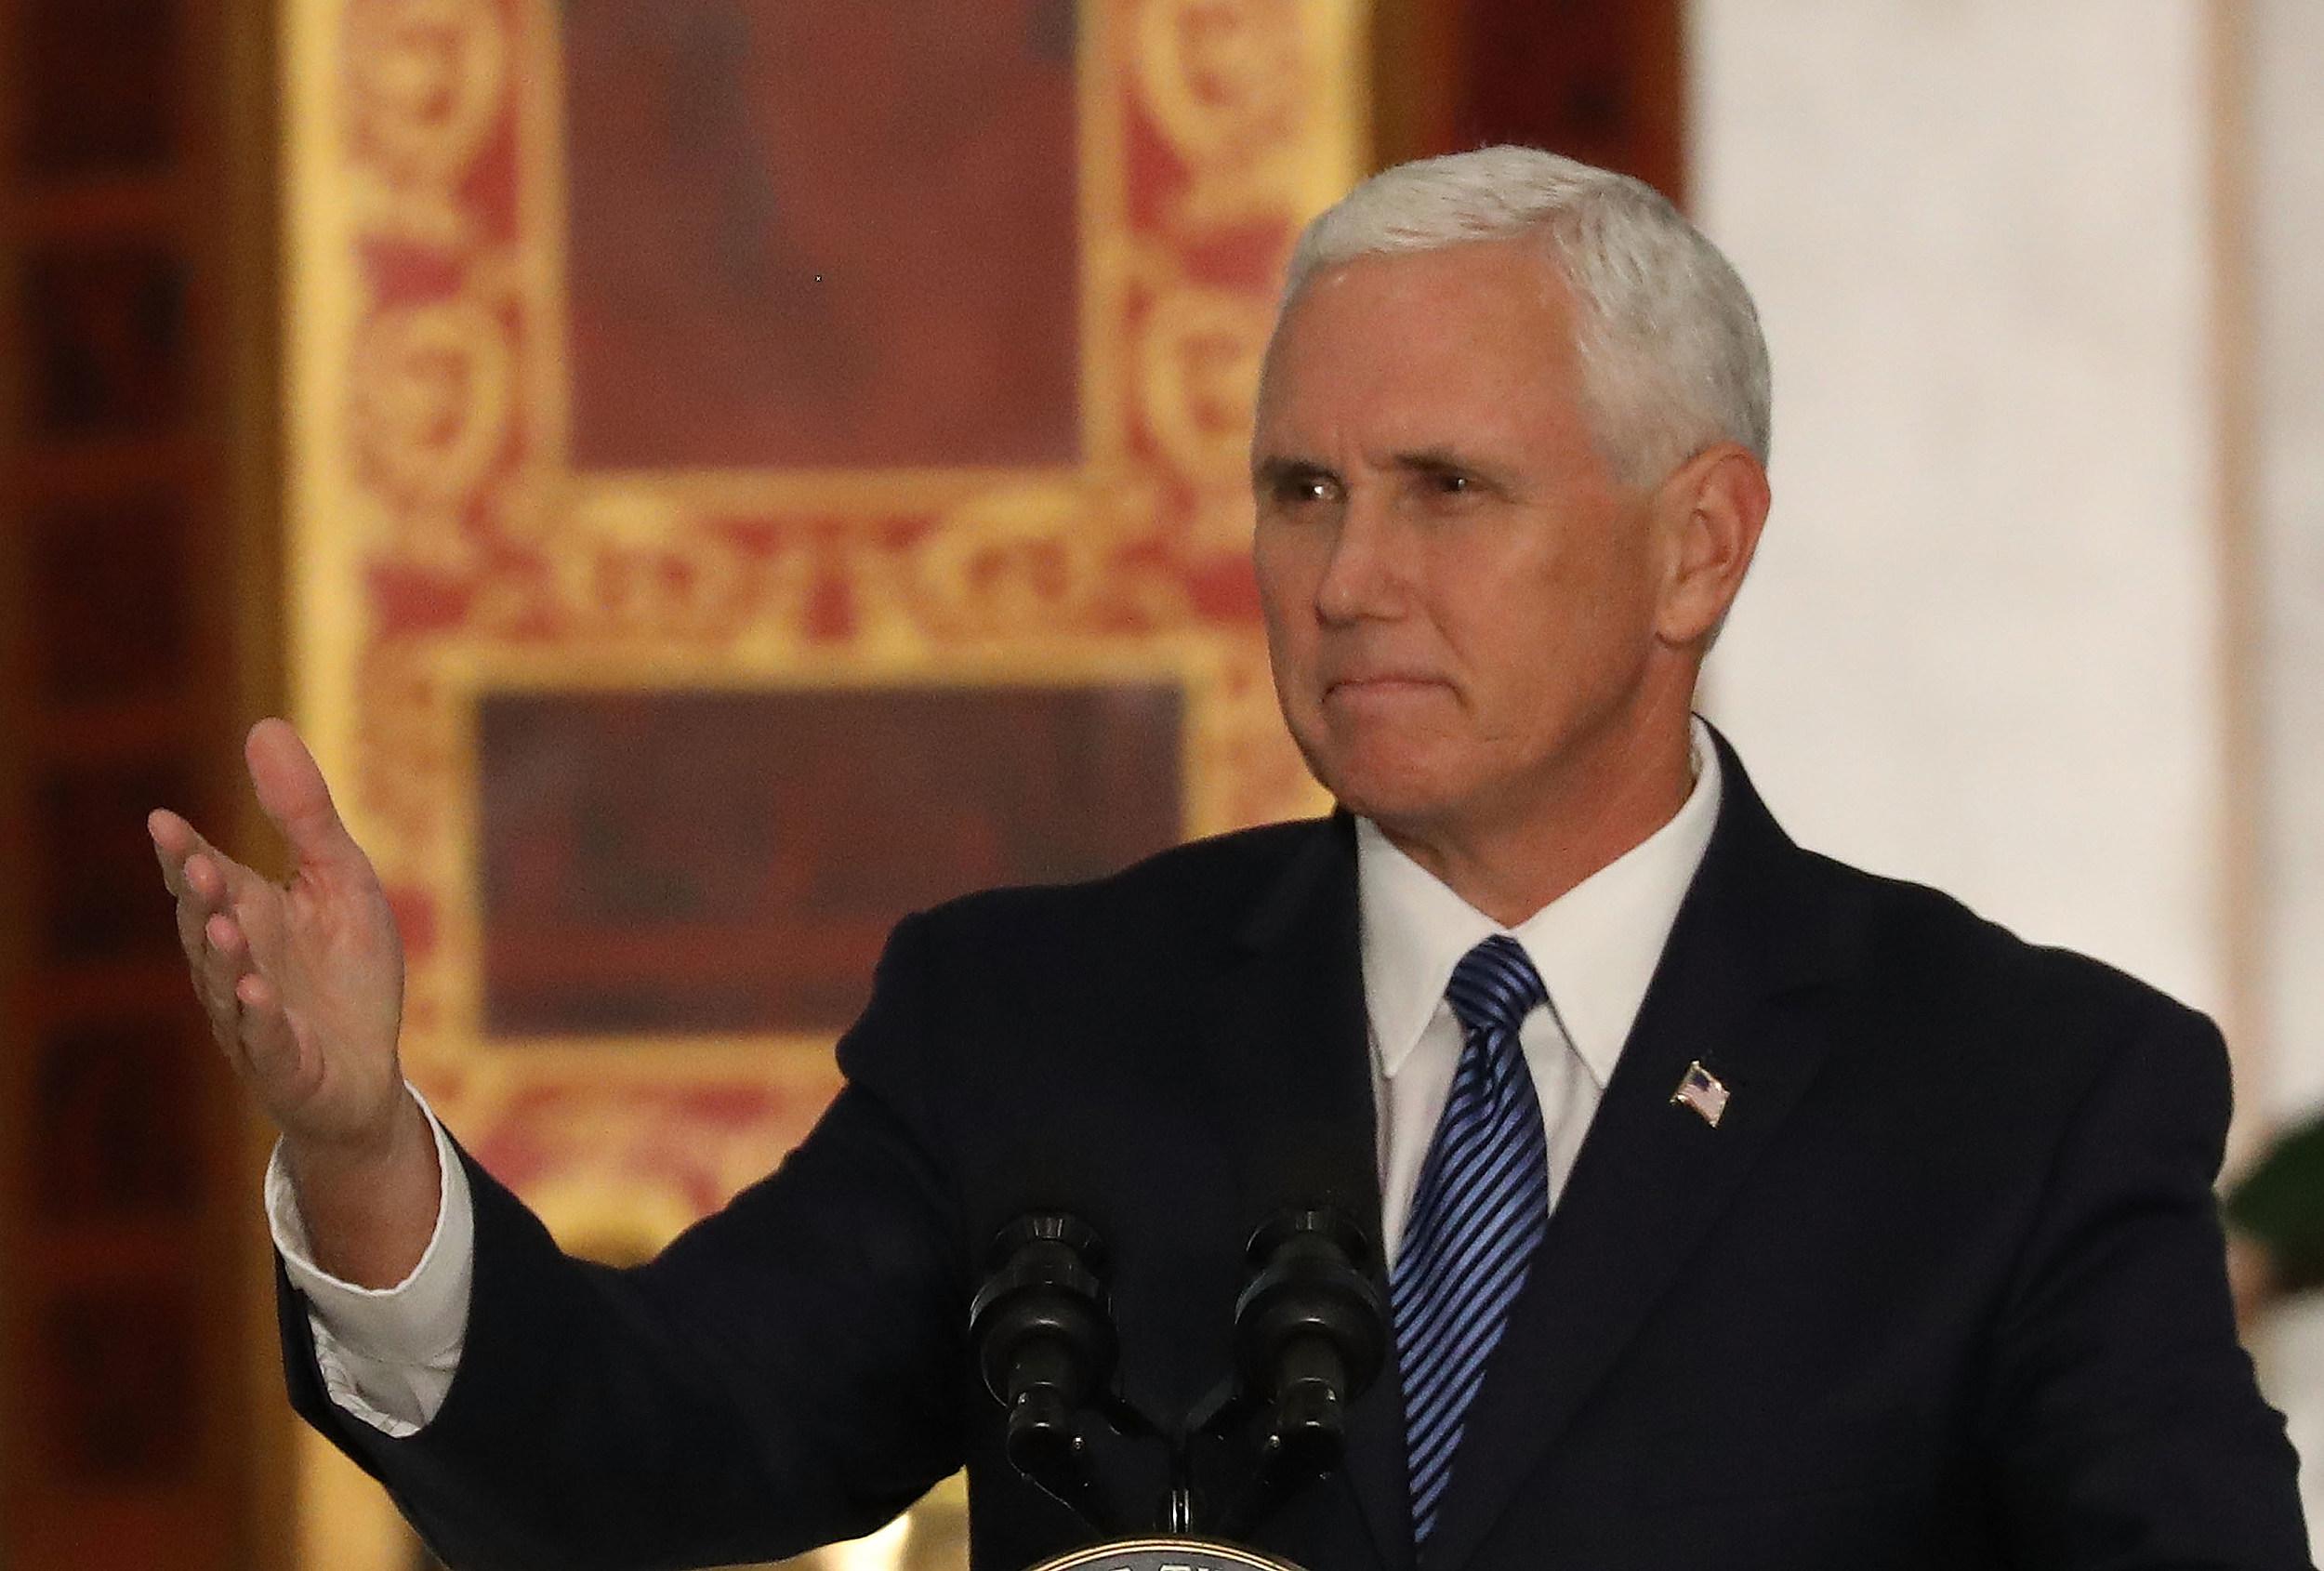 Vice President Pence Speaks To Members Of The Venzuelan Community In Doral, Florida